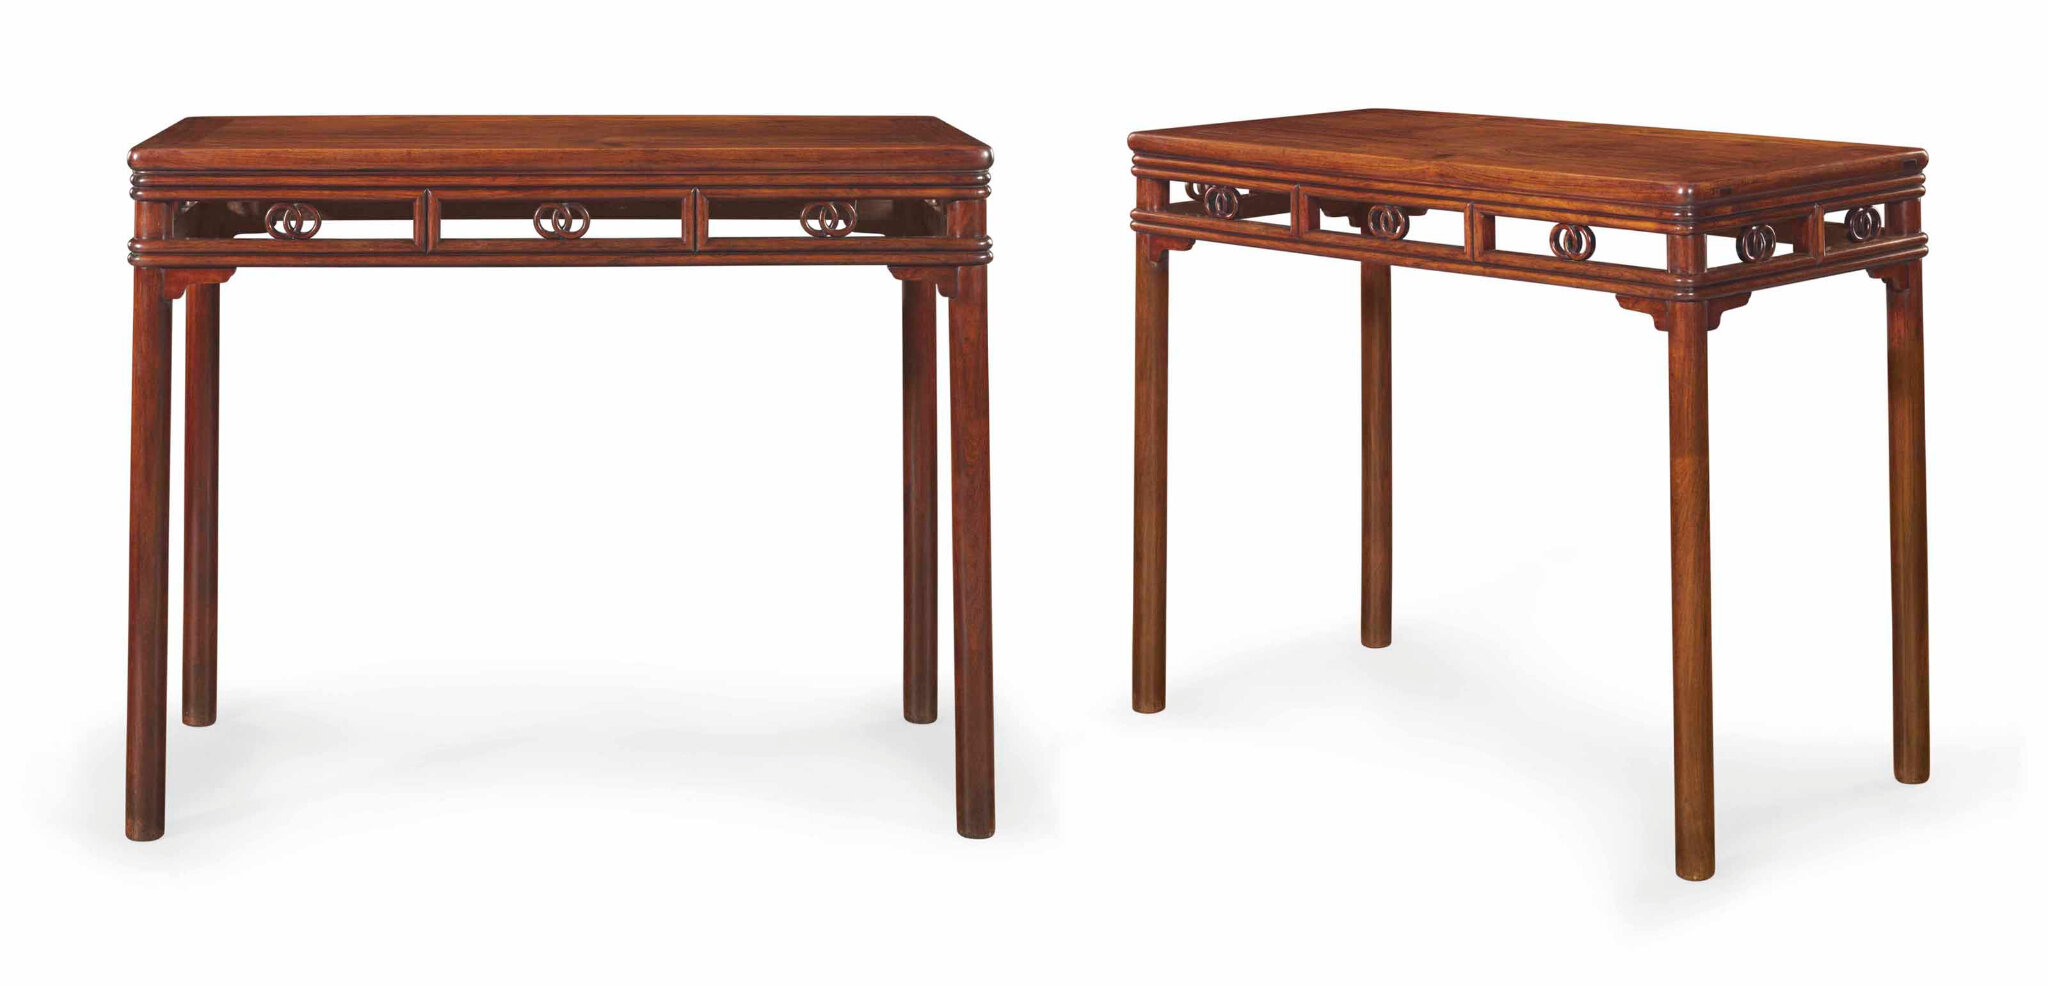 A Rare Huanghuali Rectangular Side Table 17th 18th Century Alain R Truong